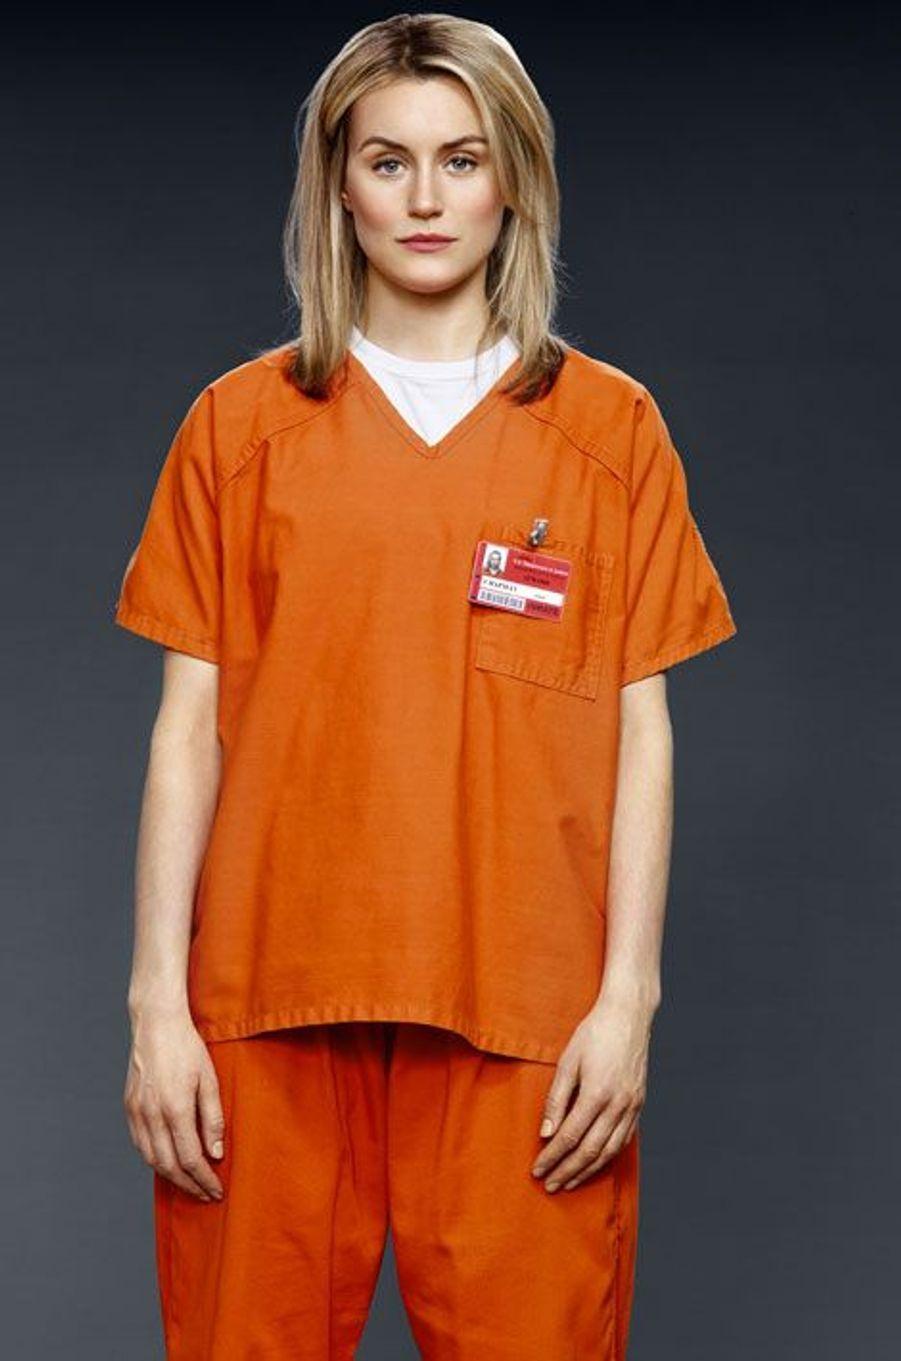 Piper Chapman (Taylor Schilling)